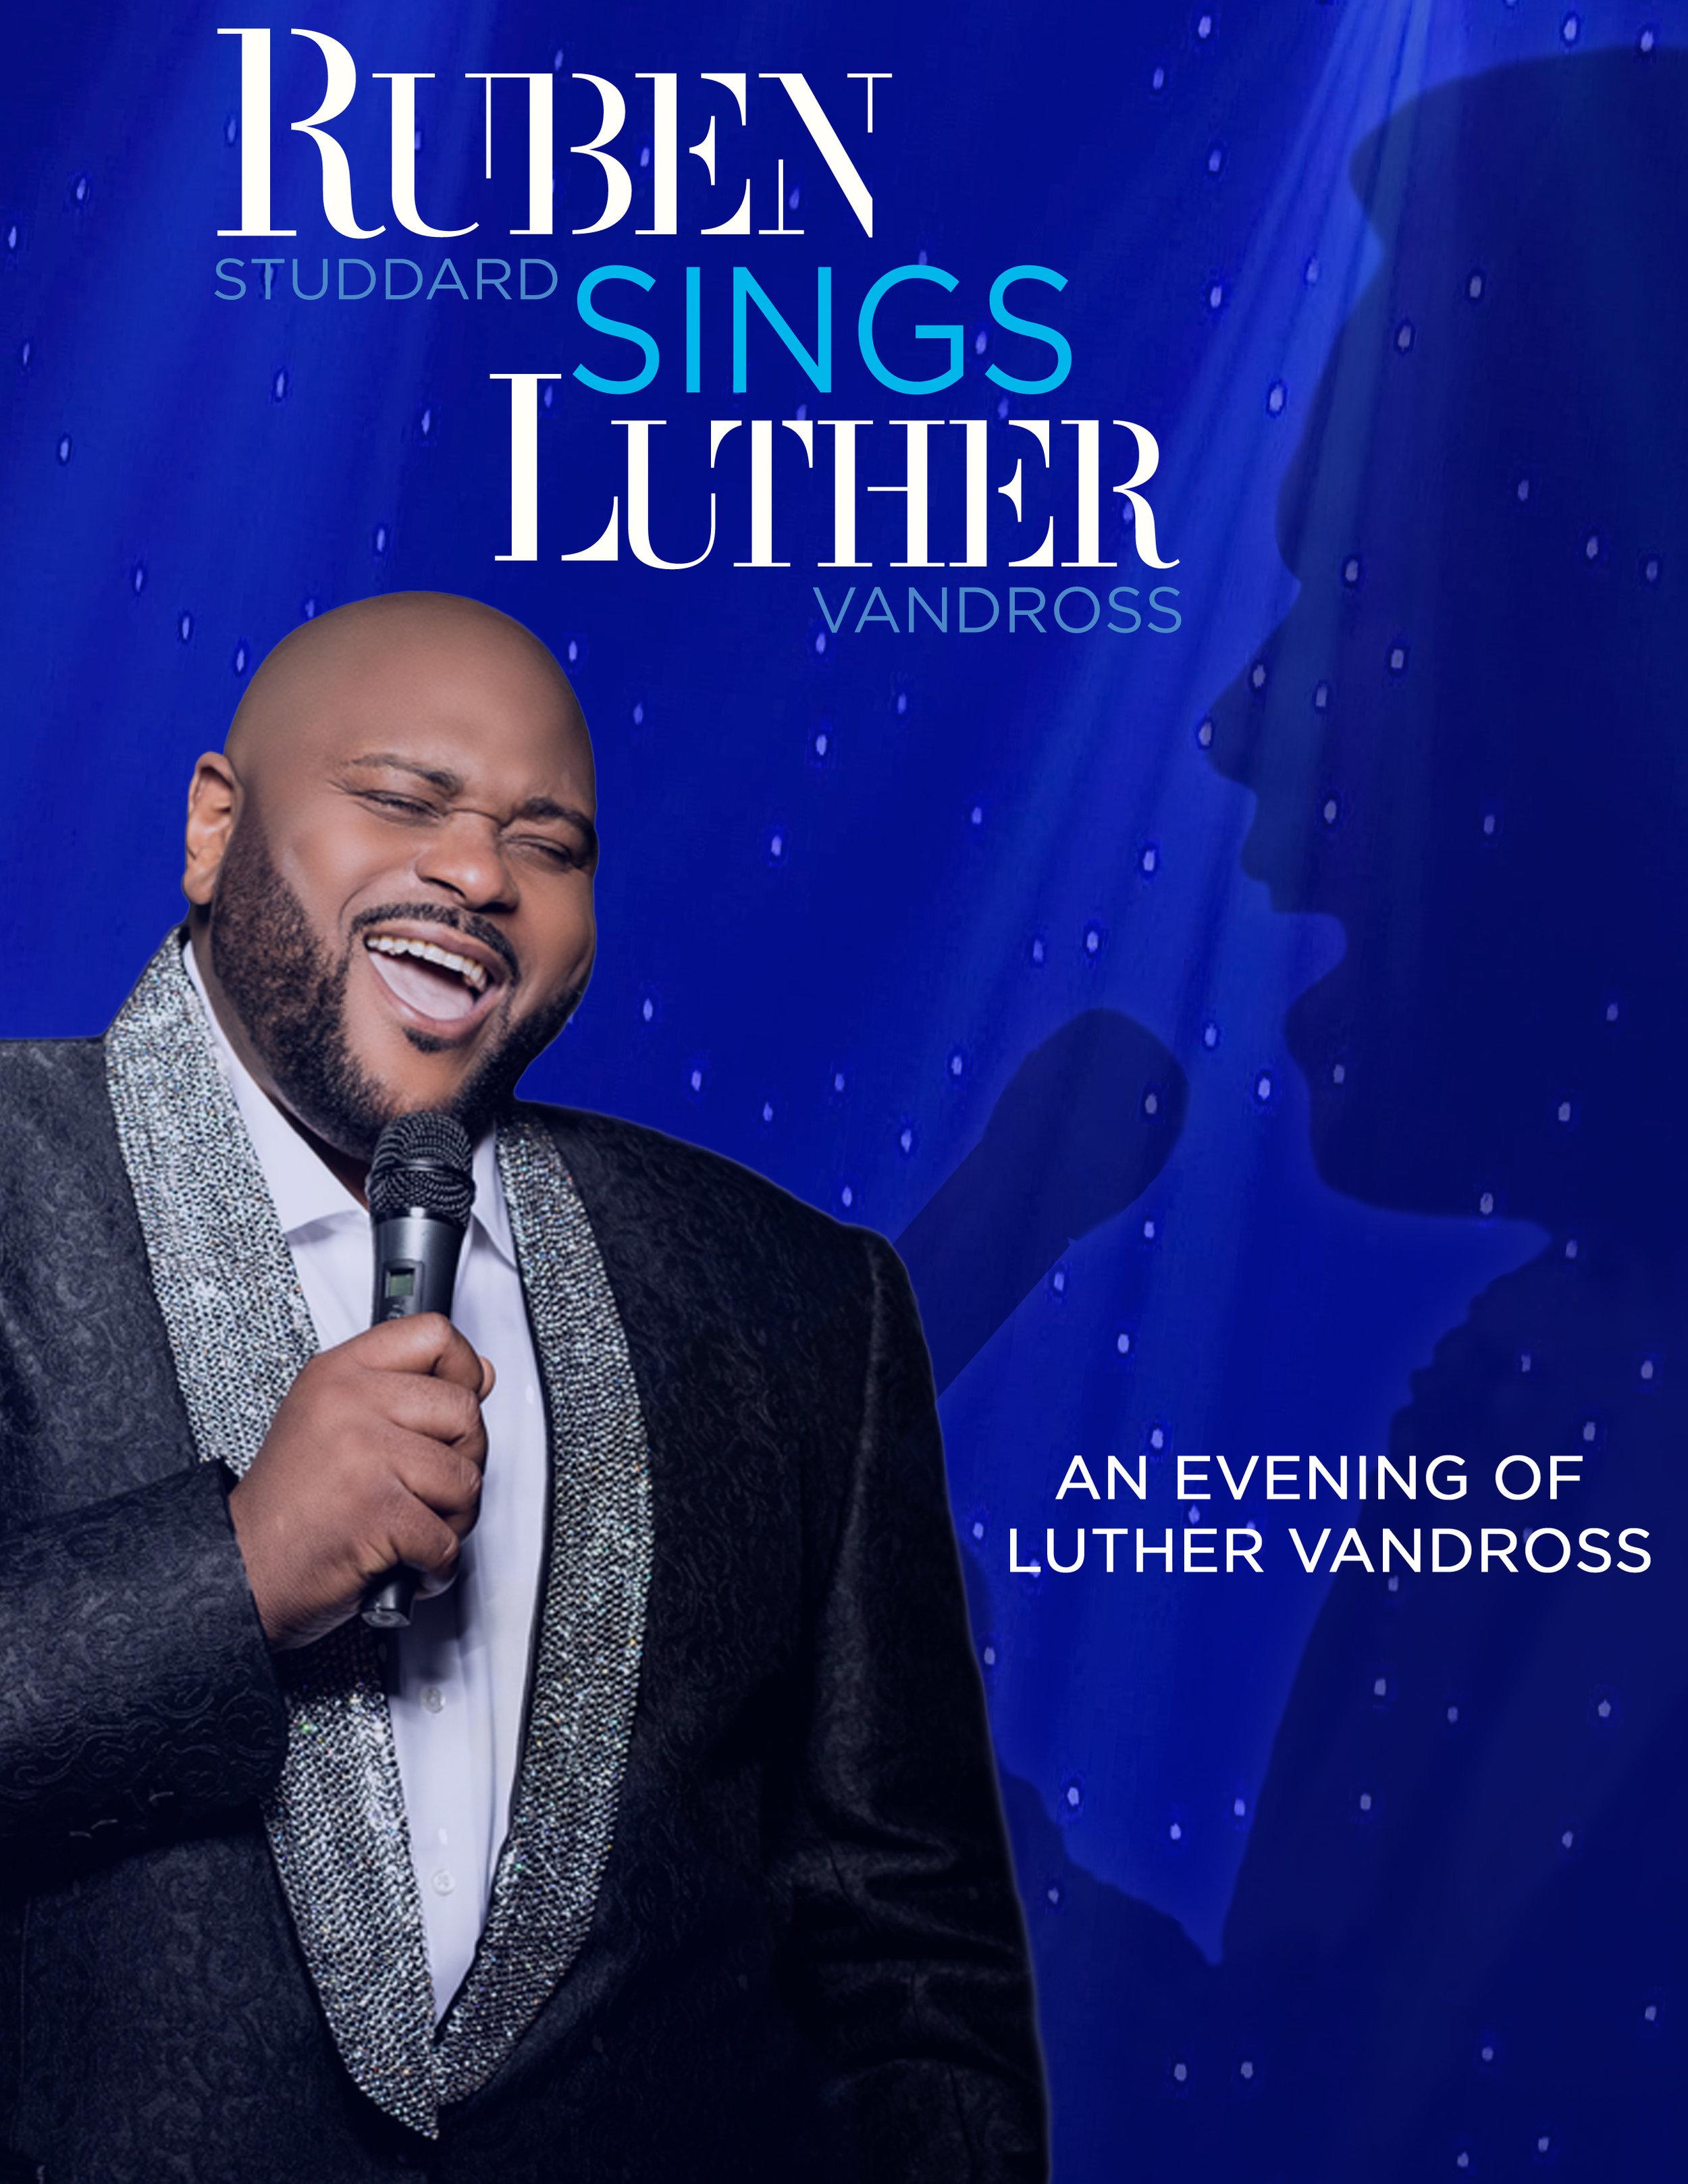 RUBEN SINGS LUTHER   An evening of LUTHER VANDROSS - starring RUBEN STUDDARD